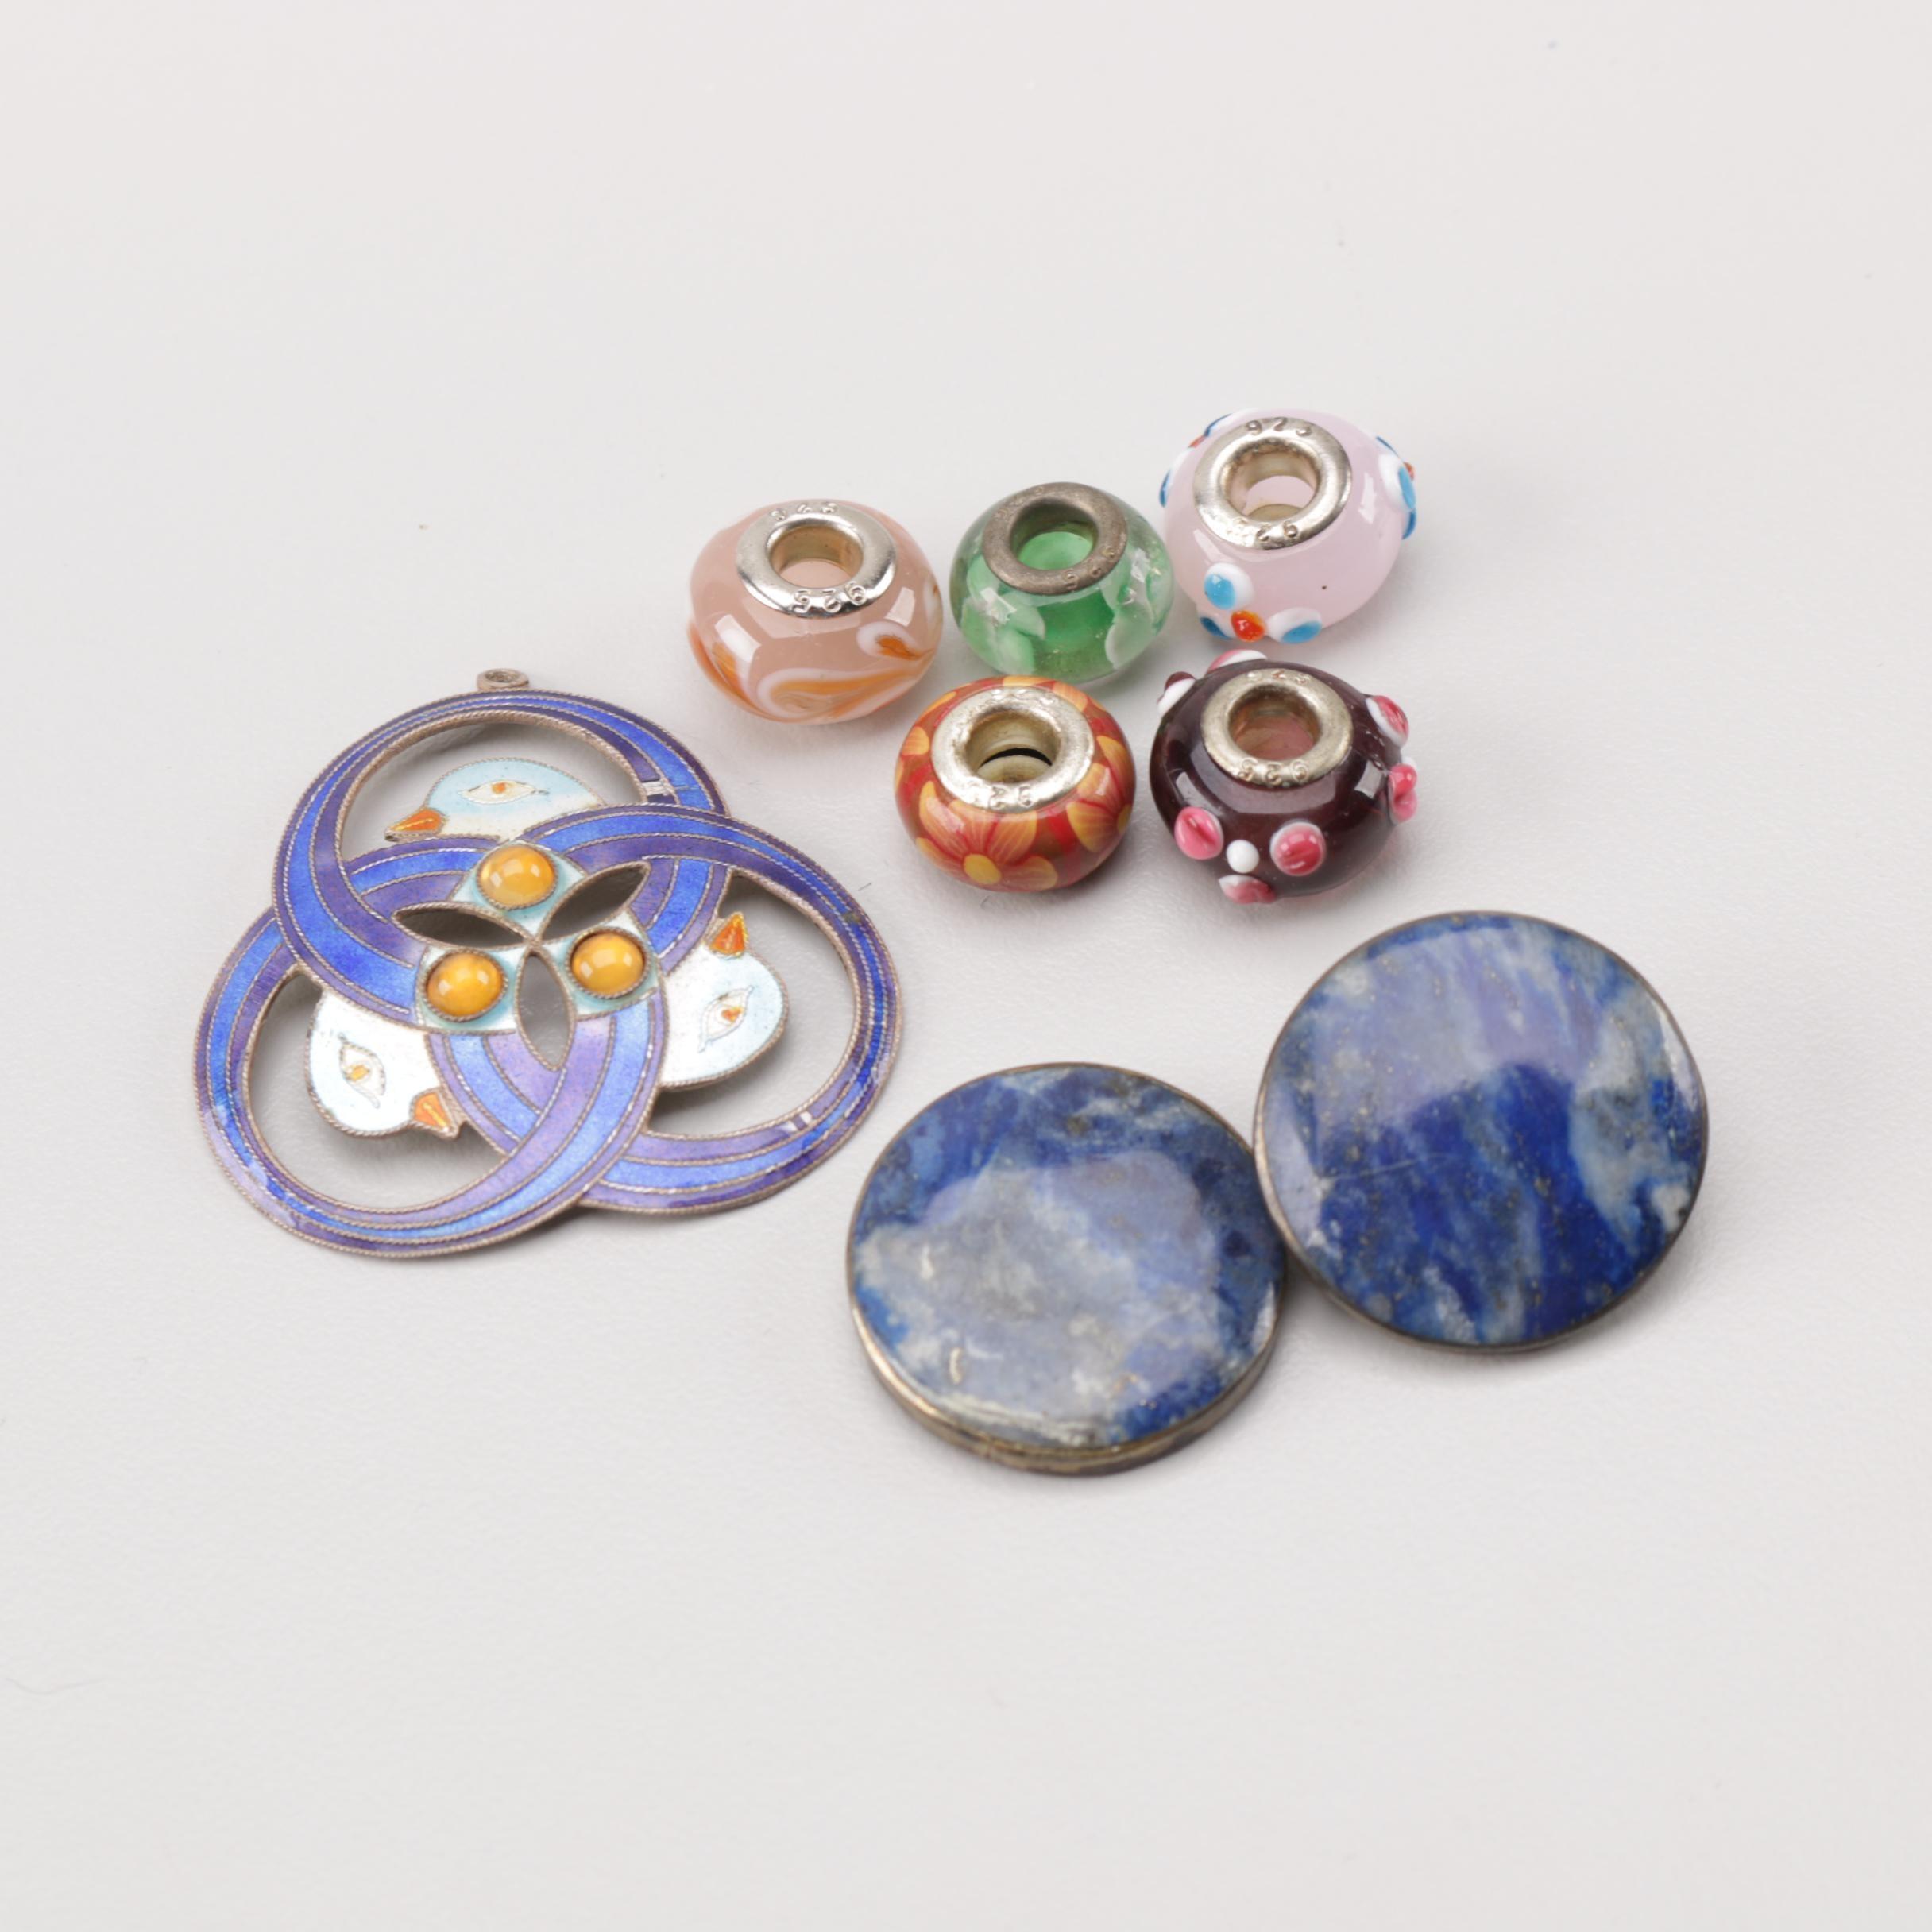 Sterling Silver Lapis Lazuli, Glass and Enamel Jewelry